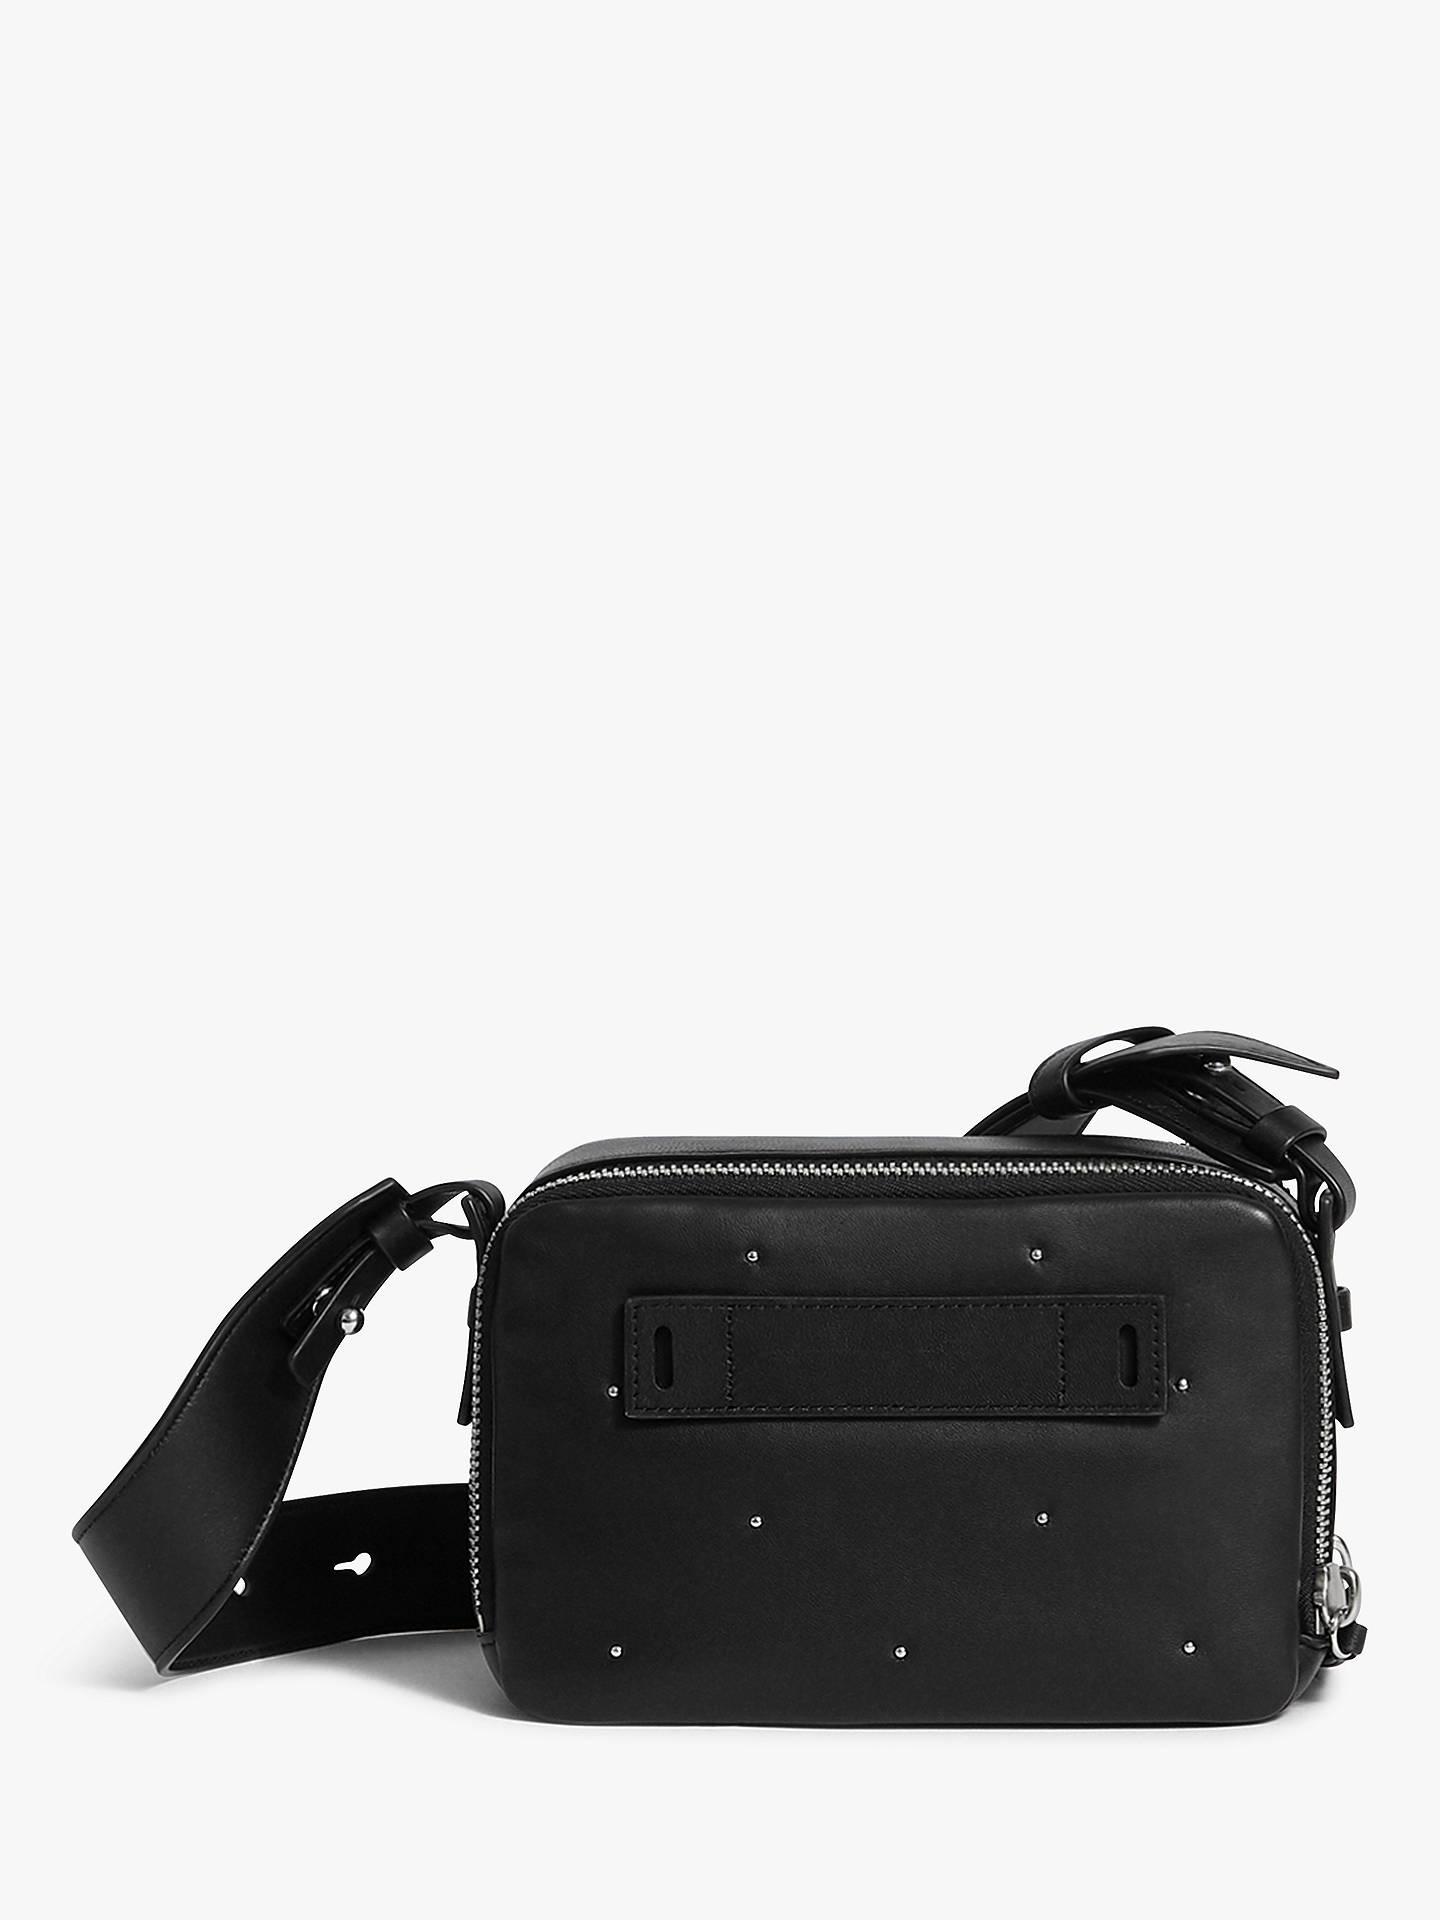 831673cd14b BuyAllSaints Kathi Leather Cross Body Bum Bag, Black Online at  johnlewis.com ...